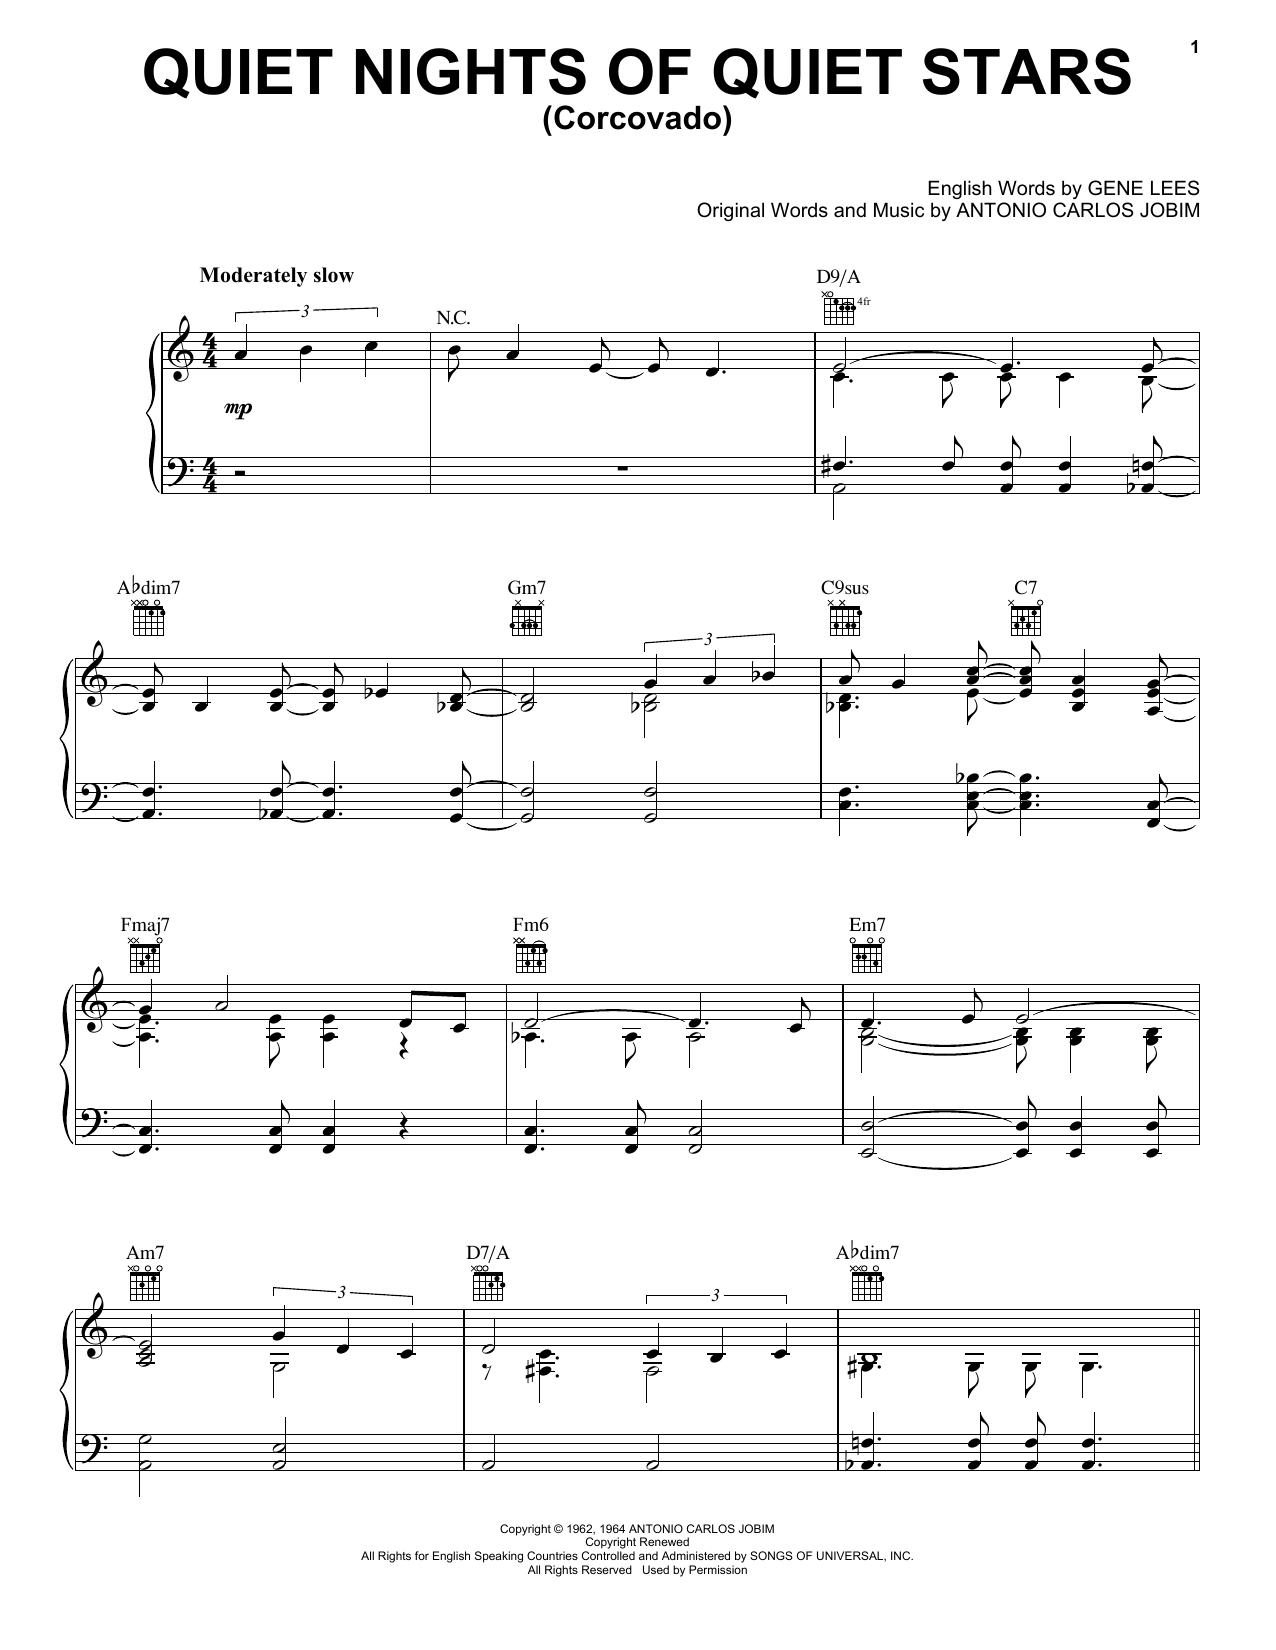 Quiet Nights Of Quiet Stars (Corcovado) sheet music